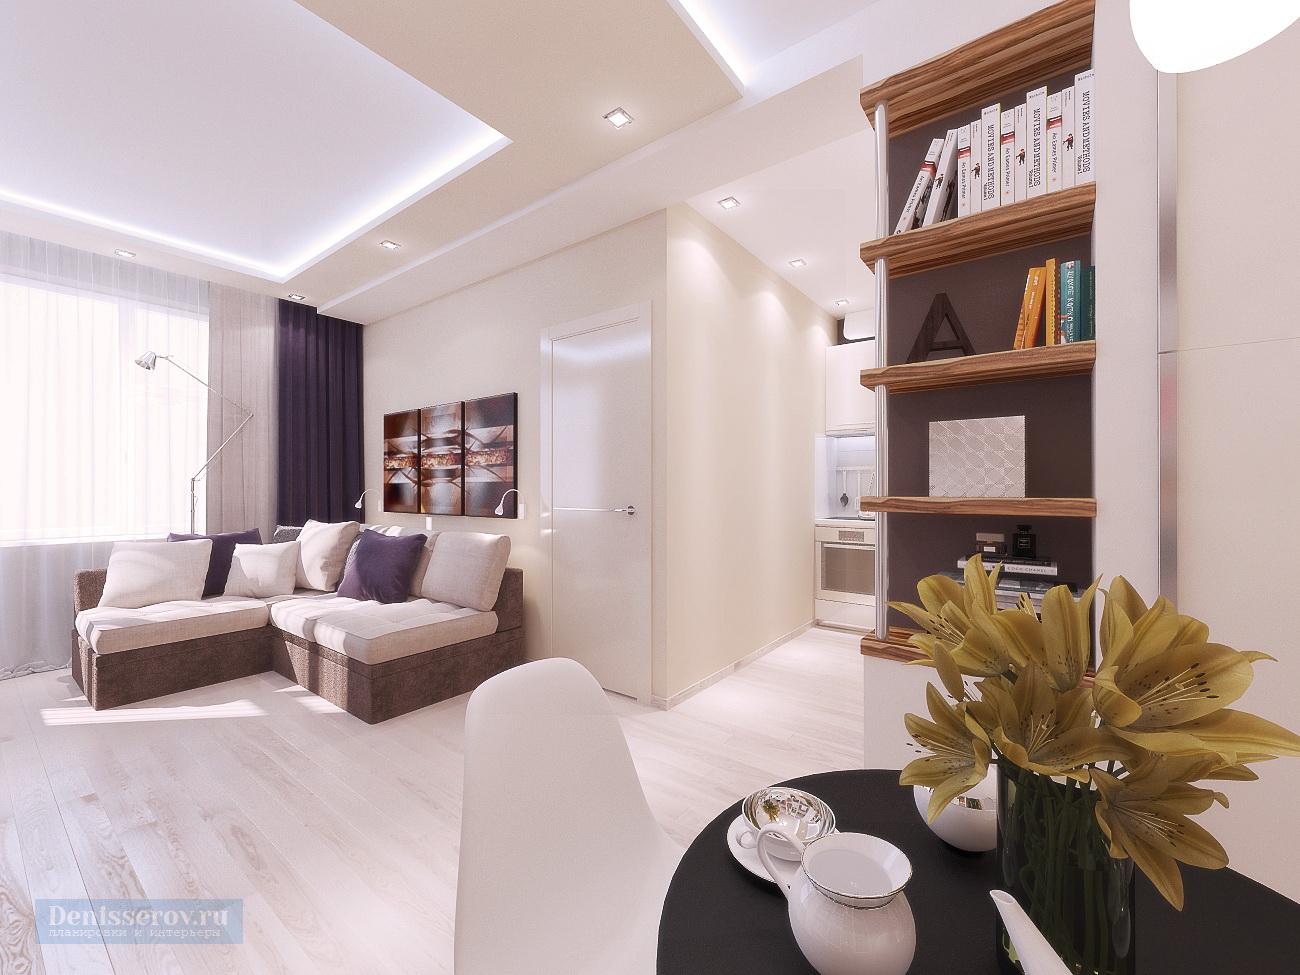 дизайн однокомнатной квартиры 35 кв.м.